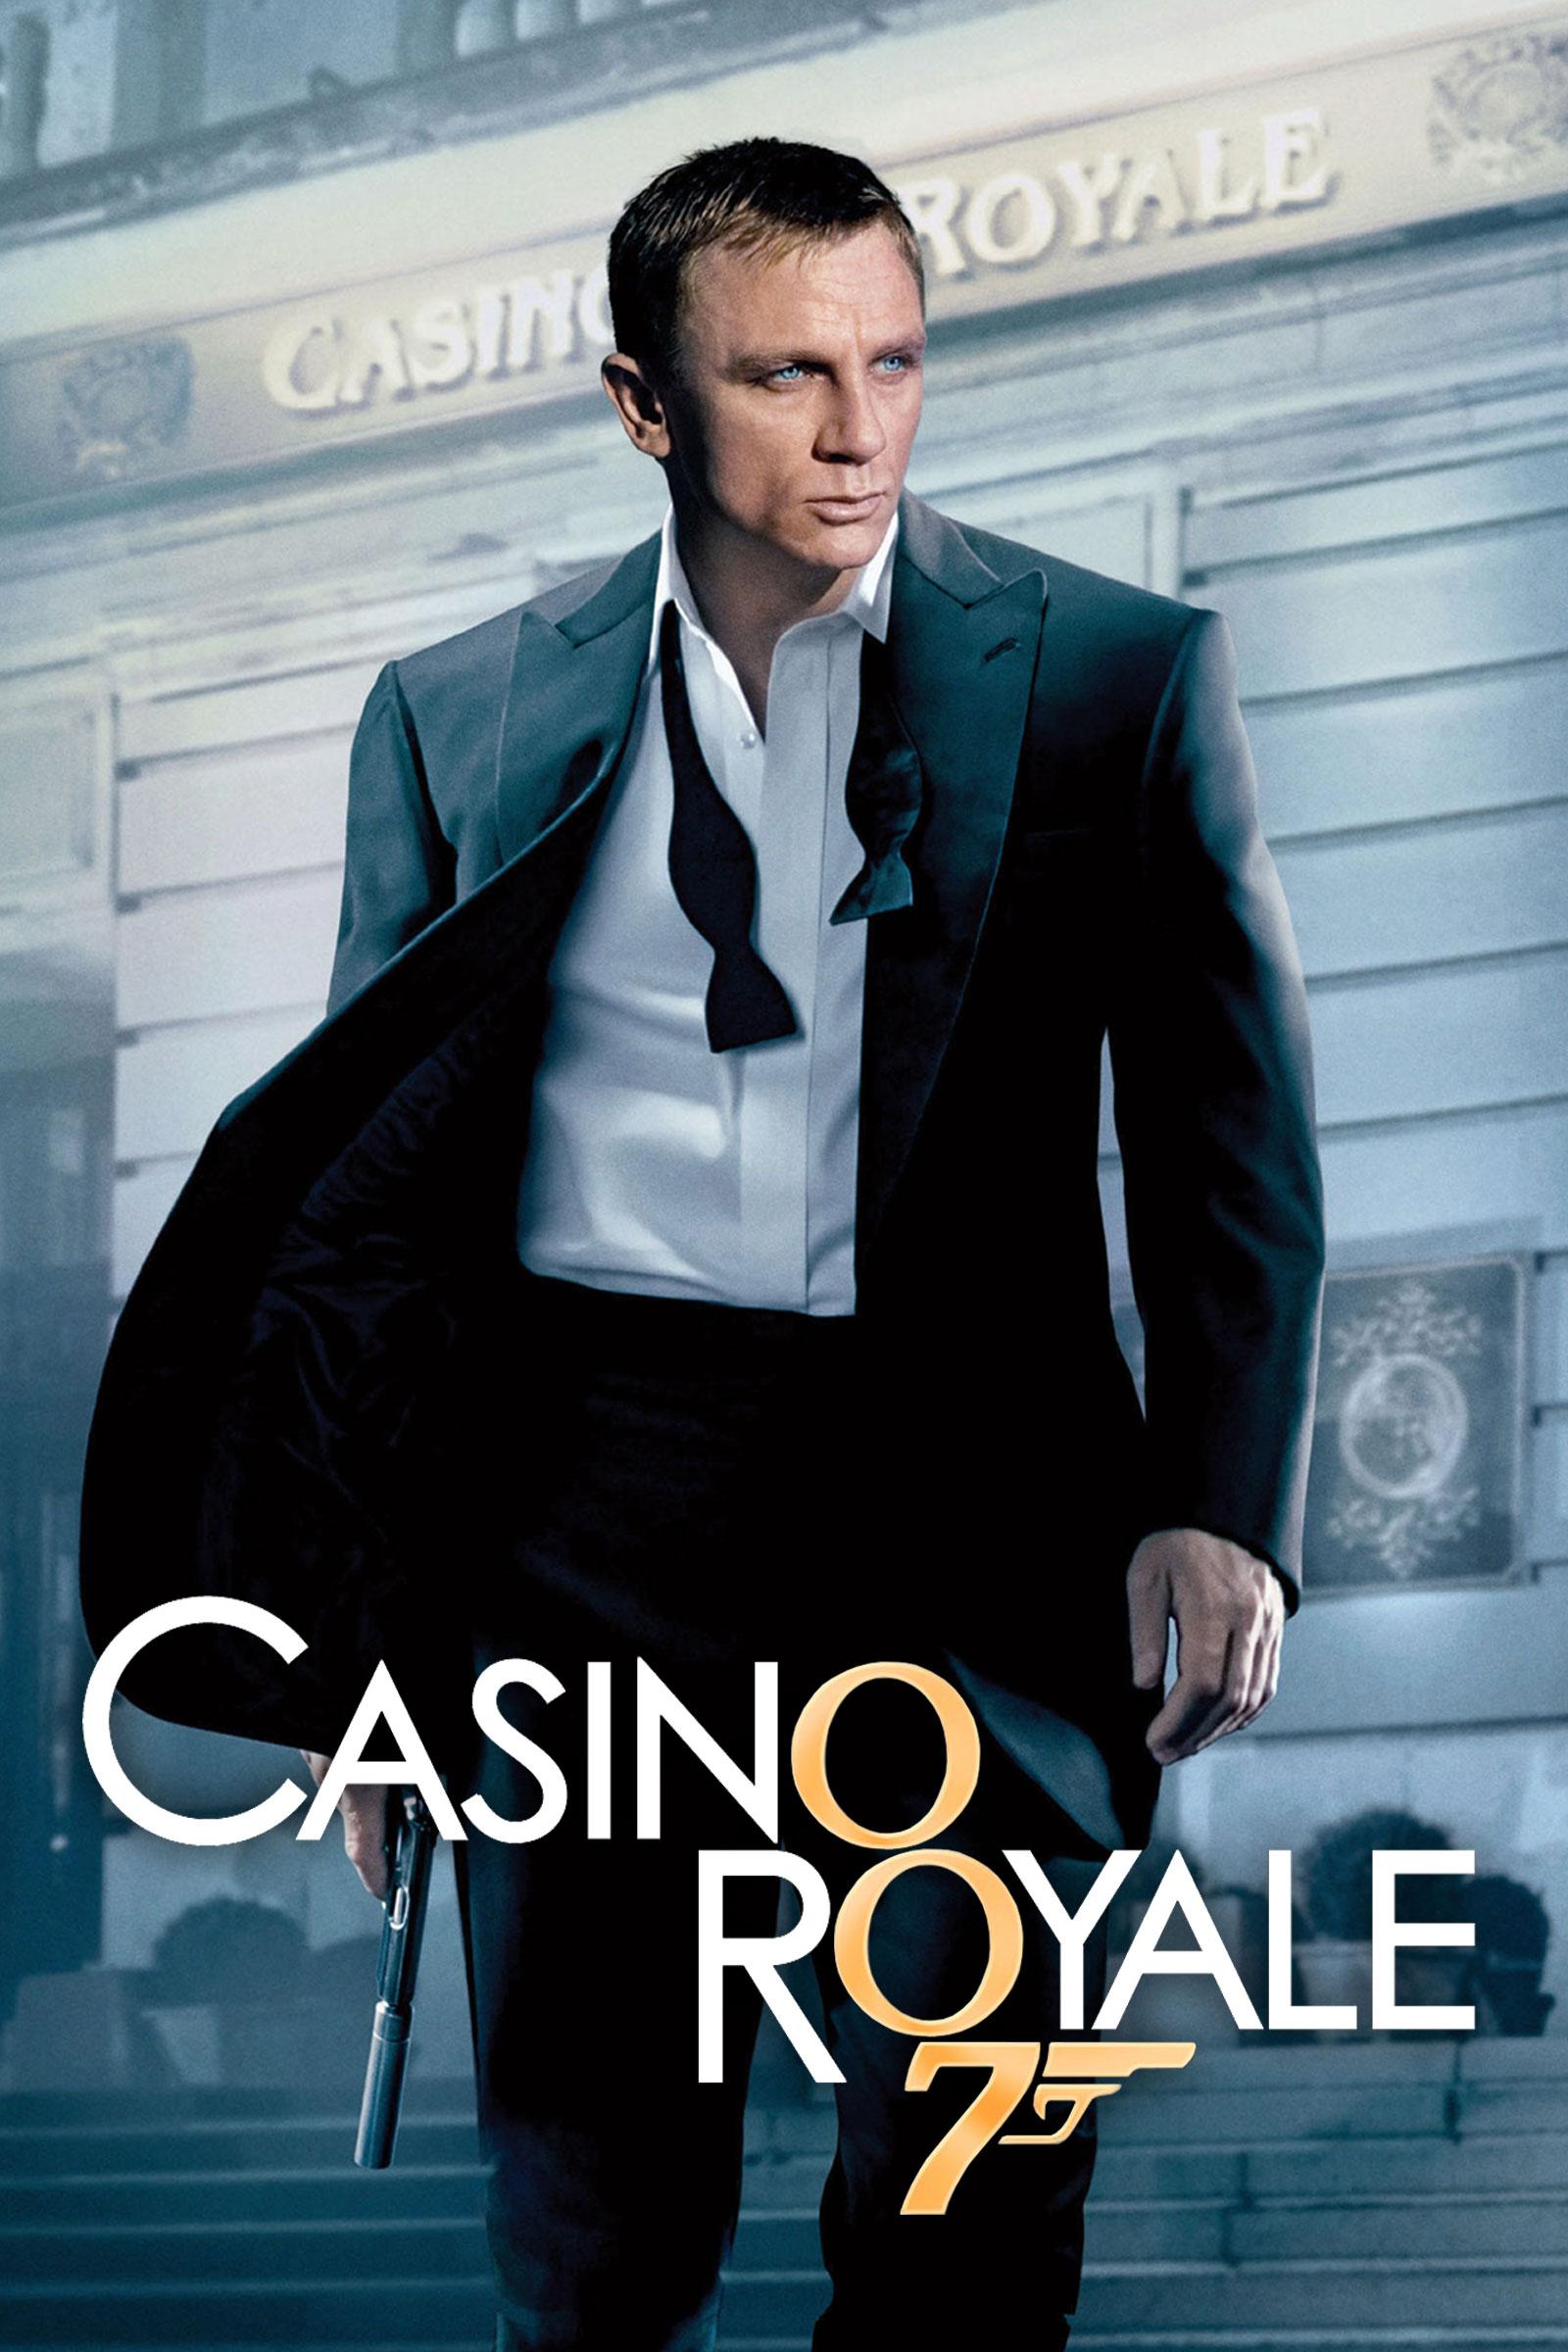 Glass crutch casino casino tips and free poker play